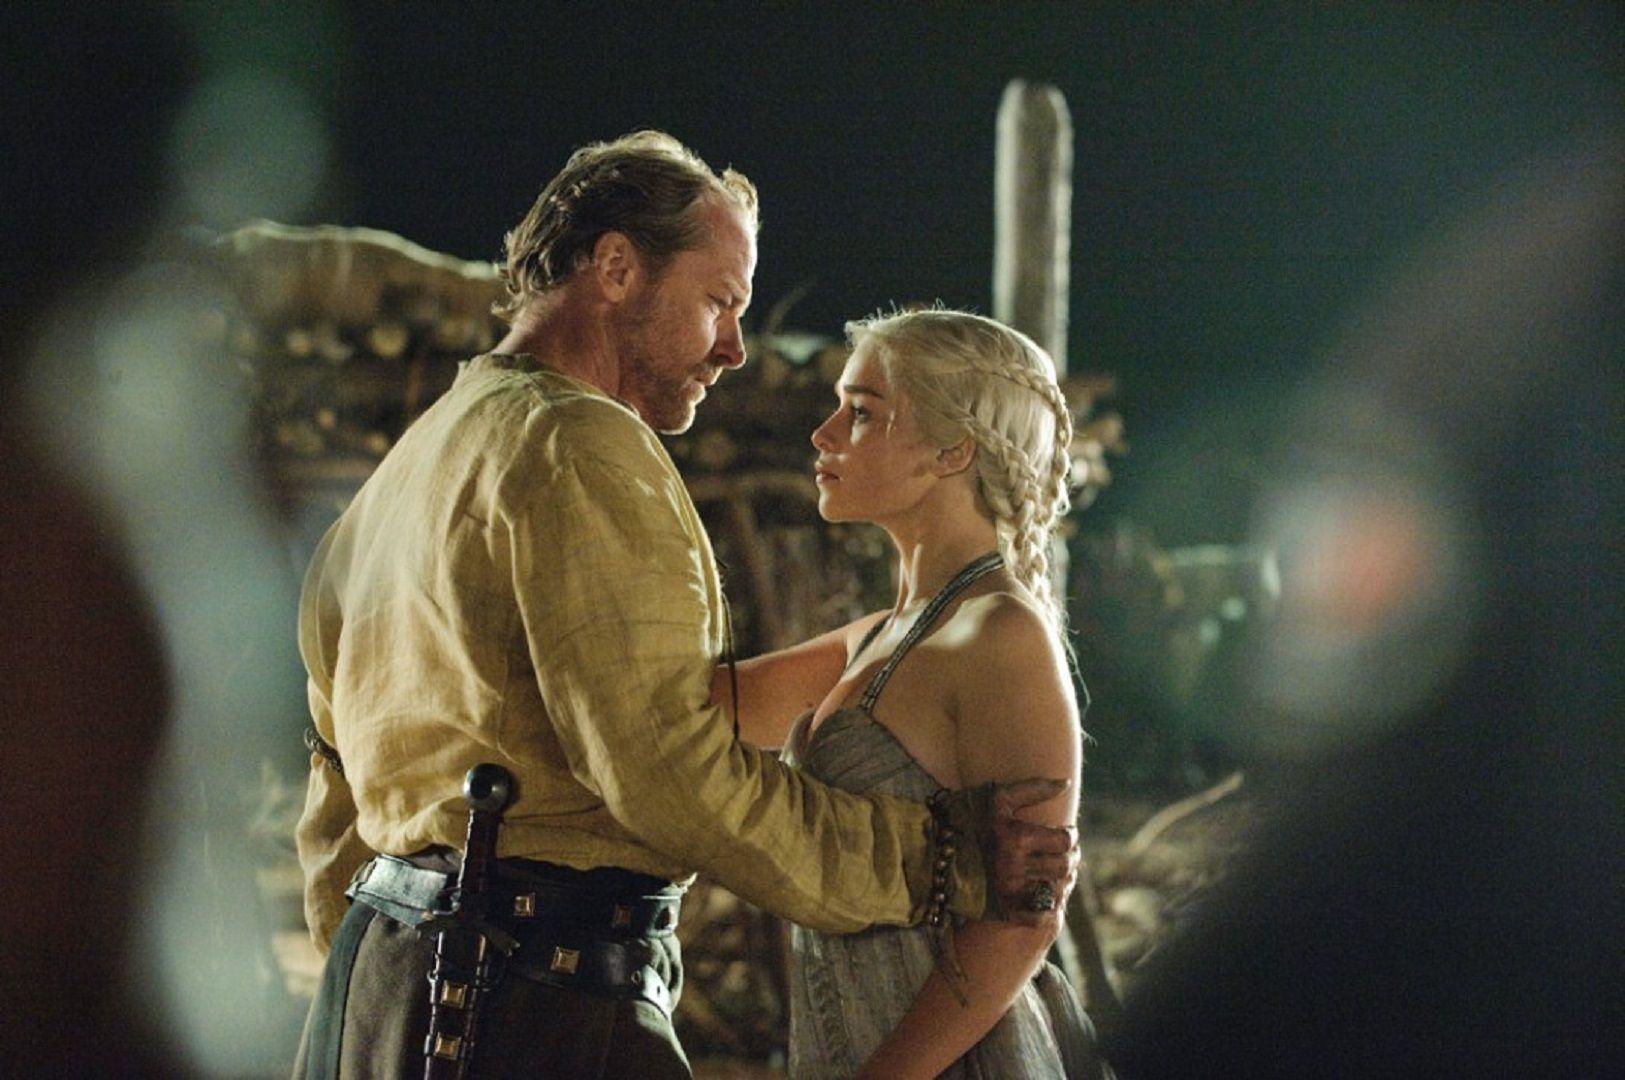 Game Of Thrones Season 1 Episode 10 Still Game Of Throne